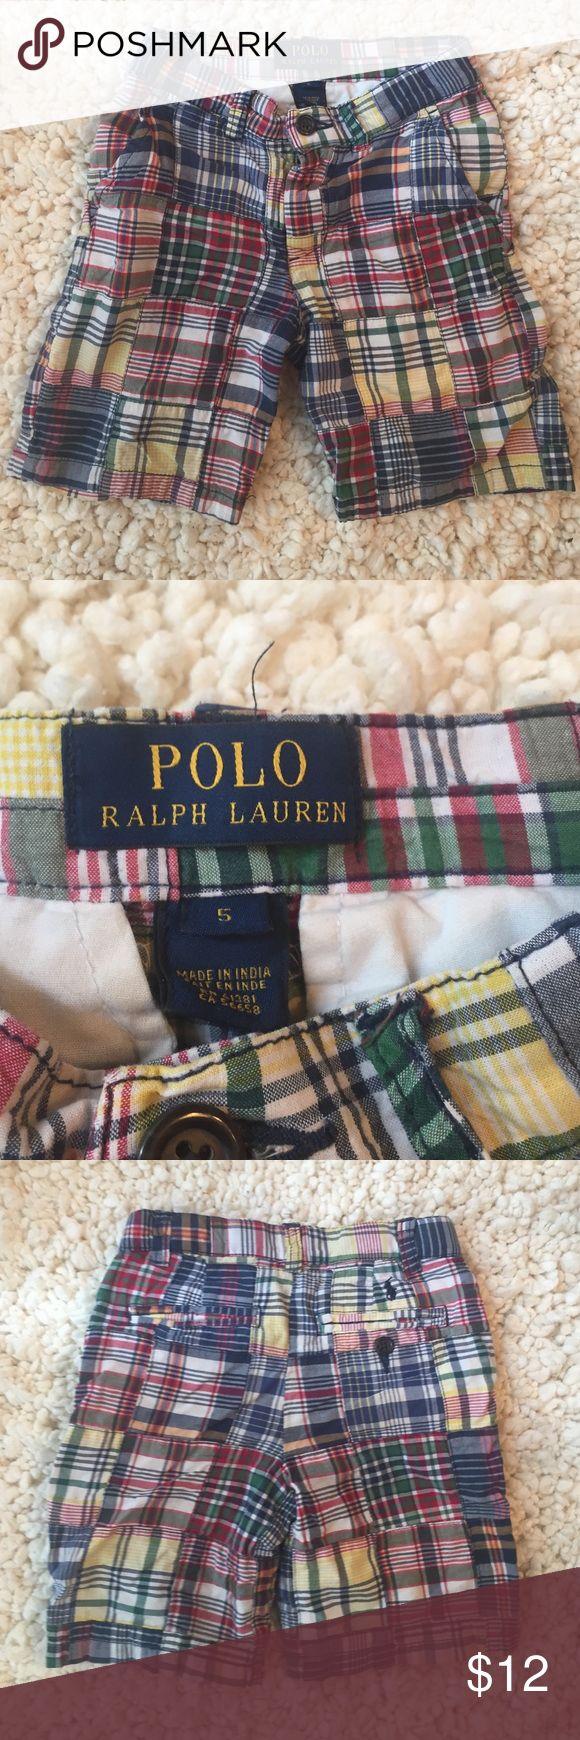 Boys Ralph Lauren Shorts Adorable patchwork plaid shorts perfect for you little man Polo by Ralph Lauren Bottoms Shorts